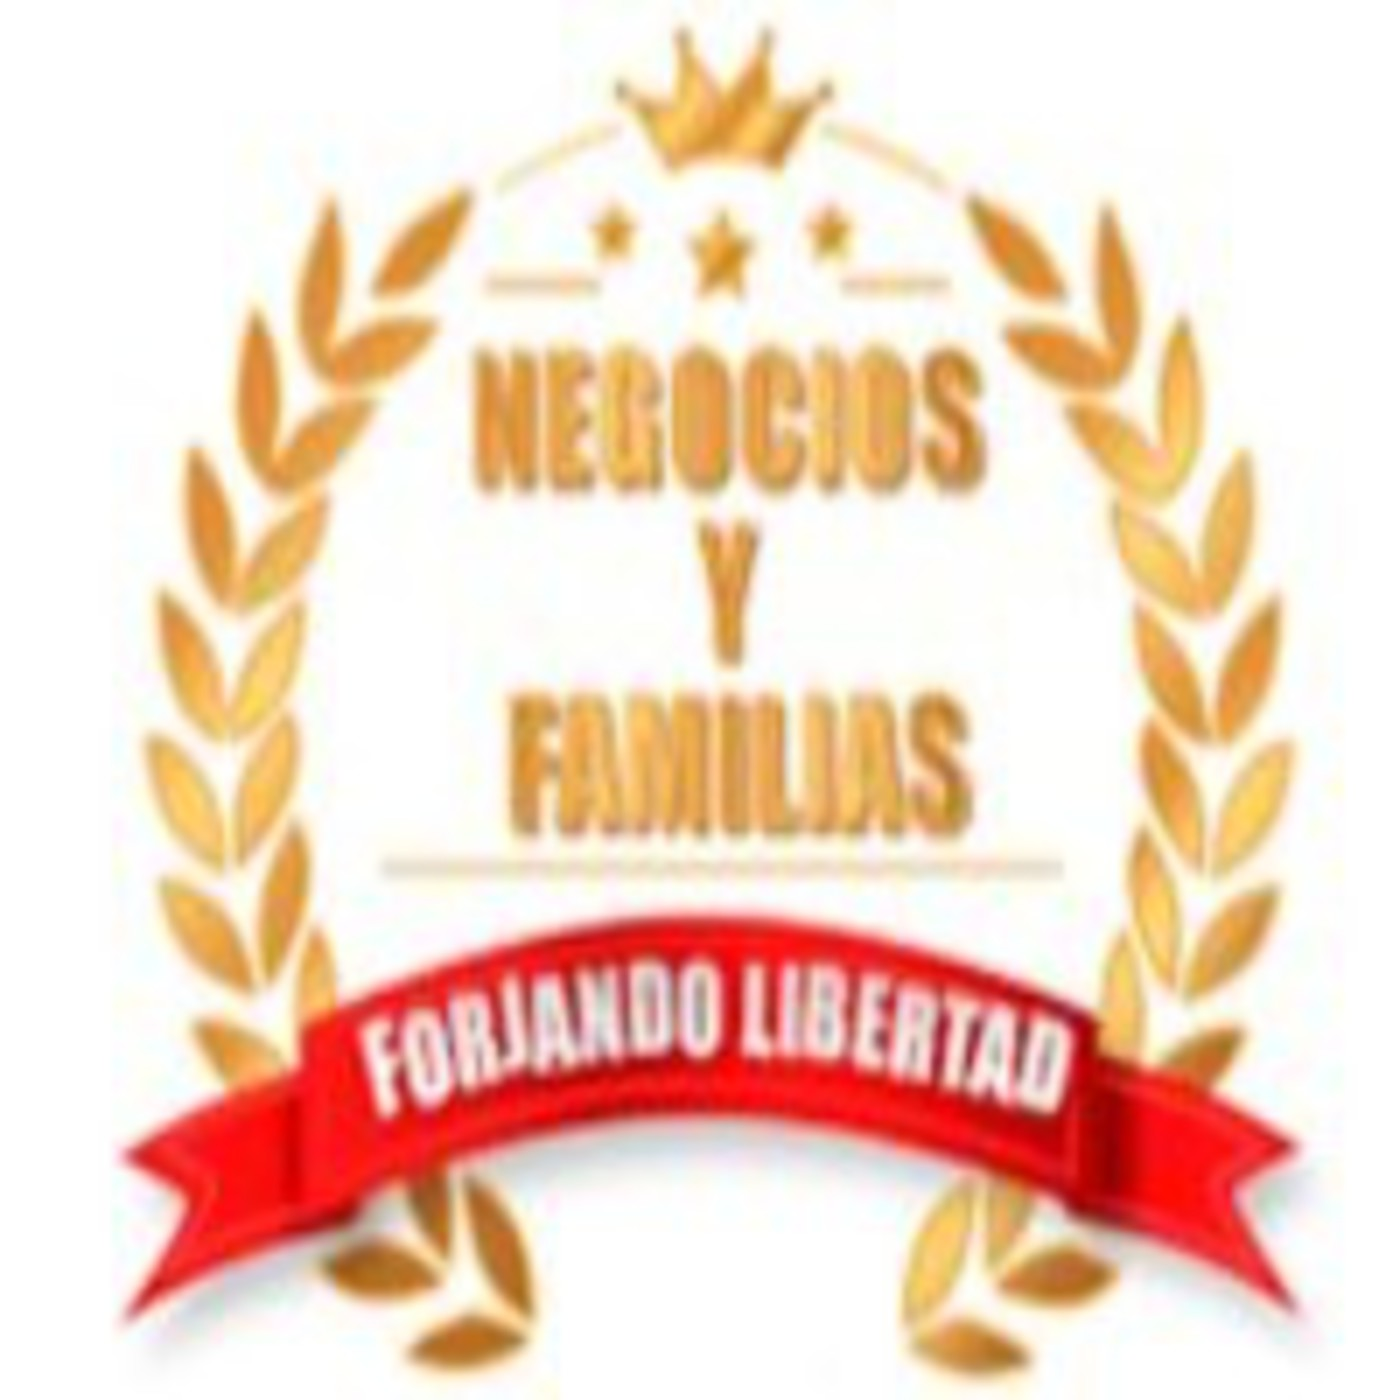 Lourdes Enriquez - Que buscan ofertas u opciones